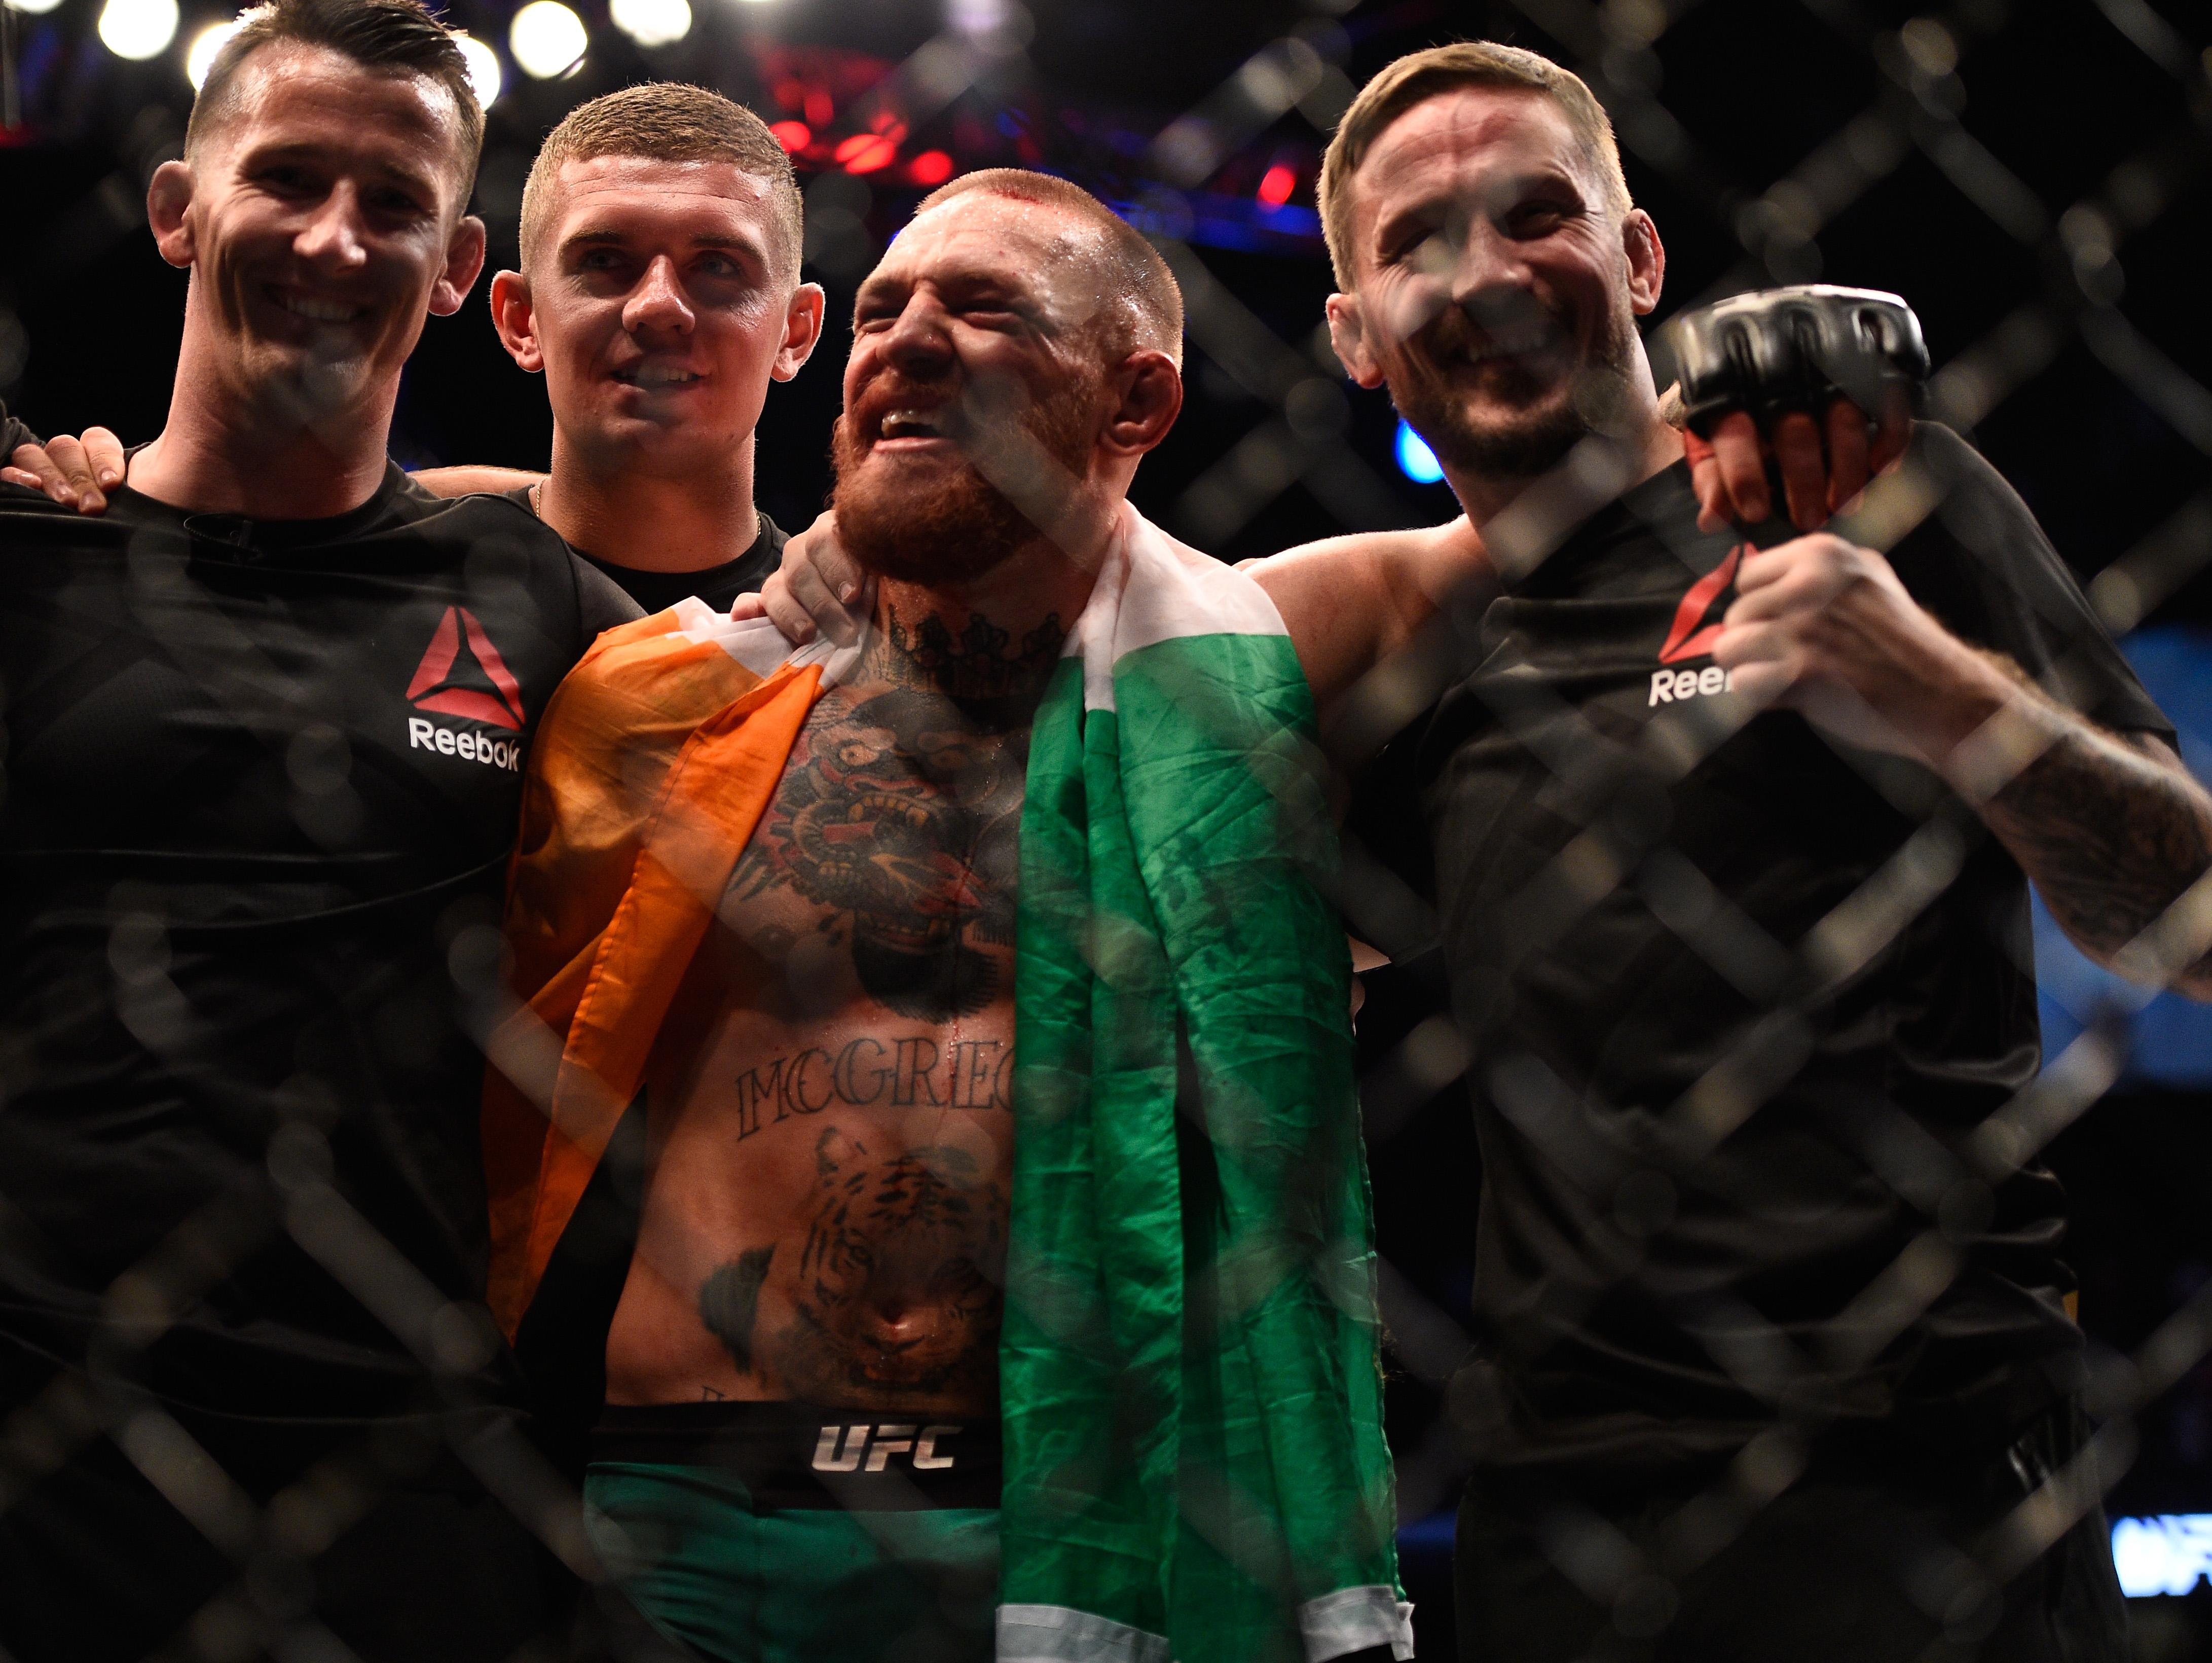 McGregor celebrates with John Kavanagh at UFC 202.gor 2